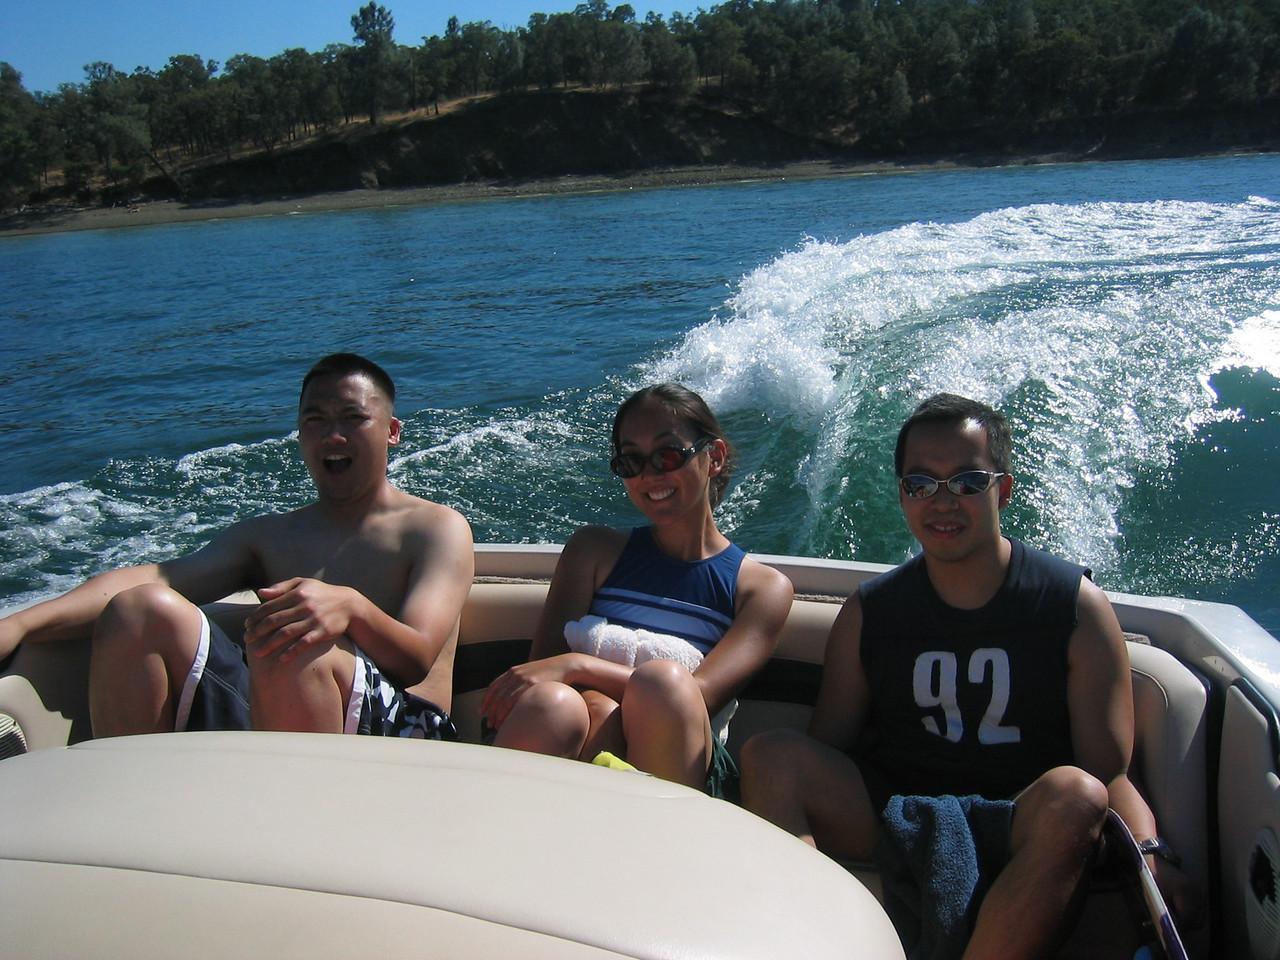 2003 08 16 Saturday - Lake Berryessa Trip, Alan Su, Cheryl & Brittany's friend, & Johnny Dong on speedboat